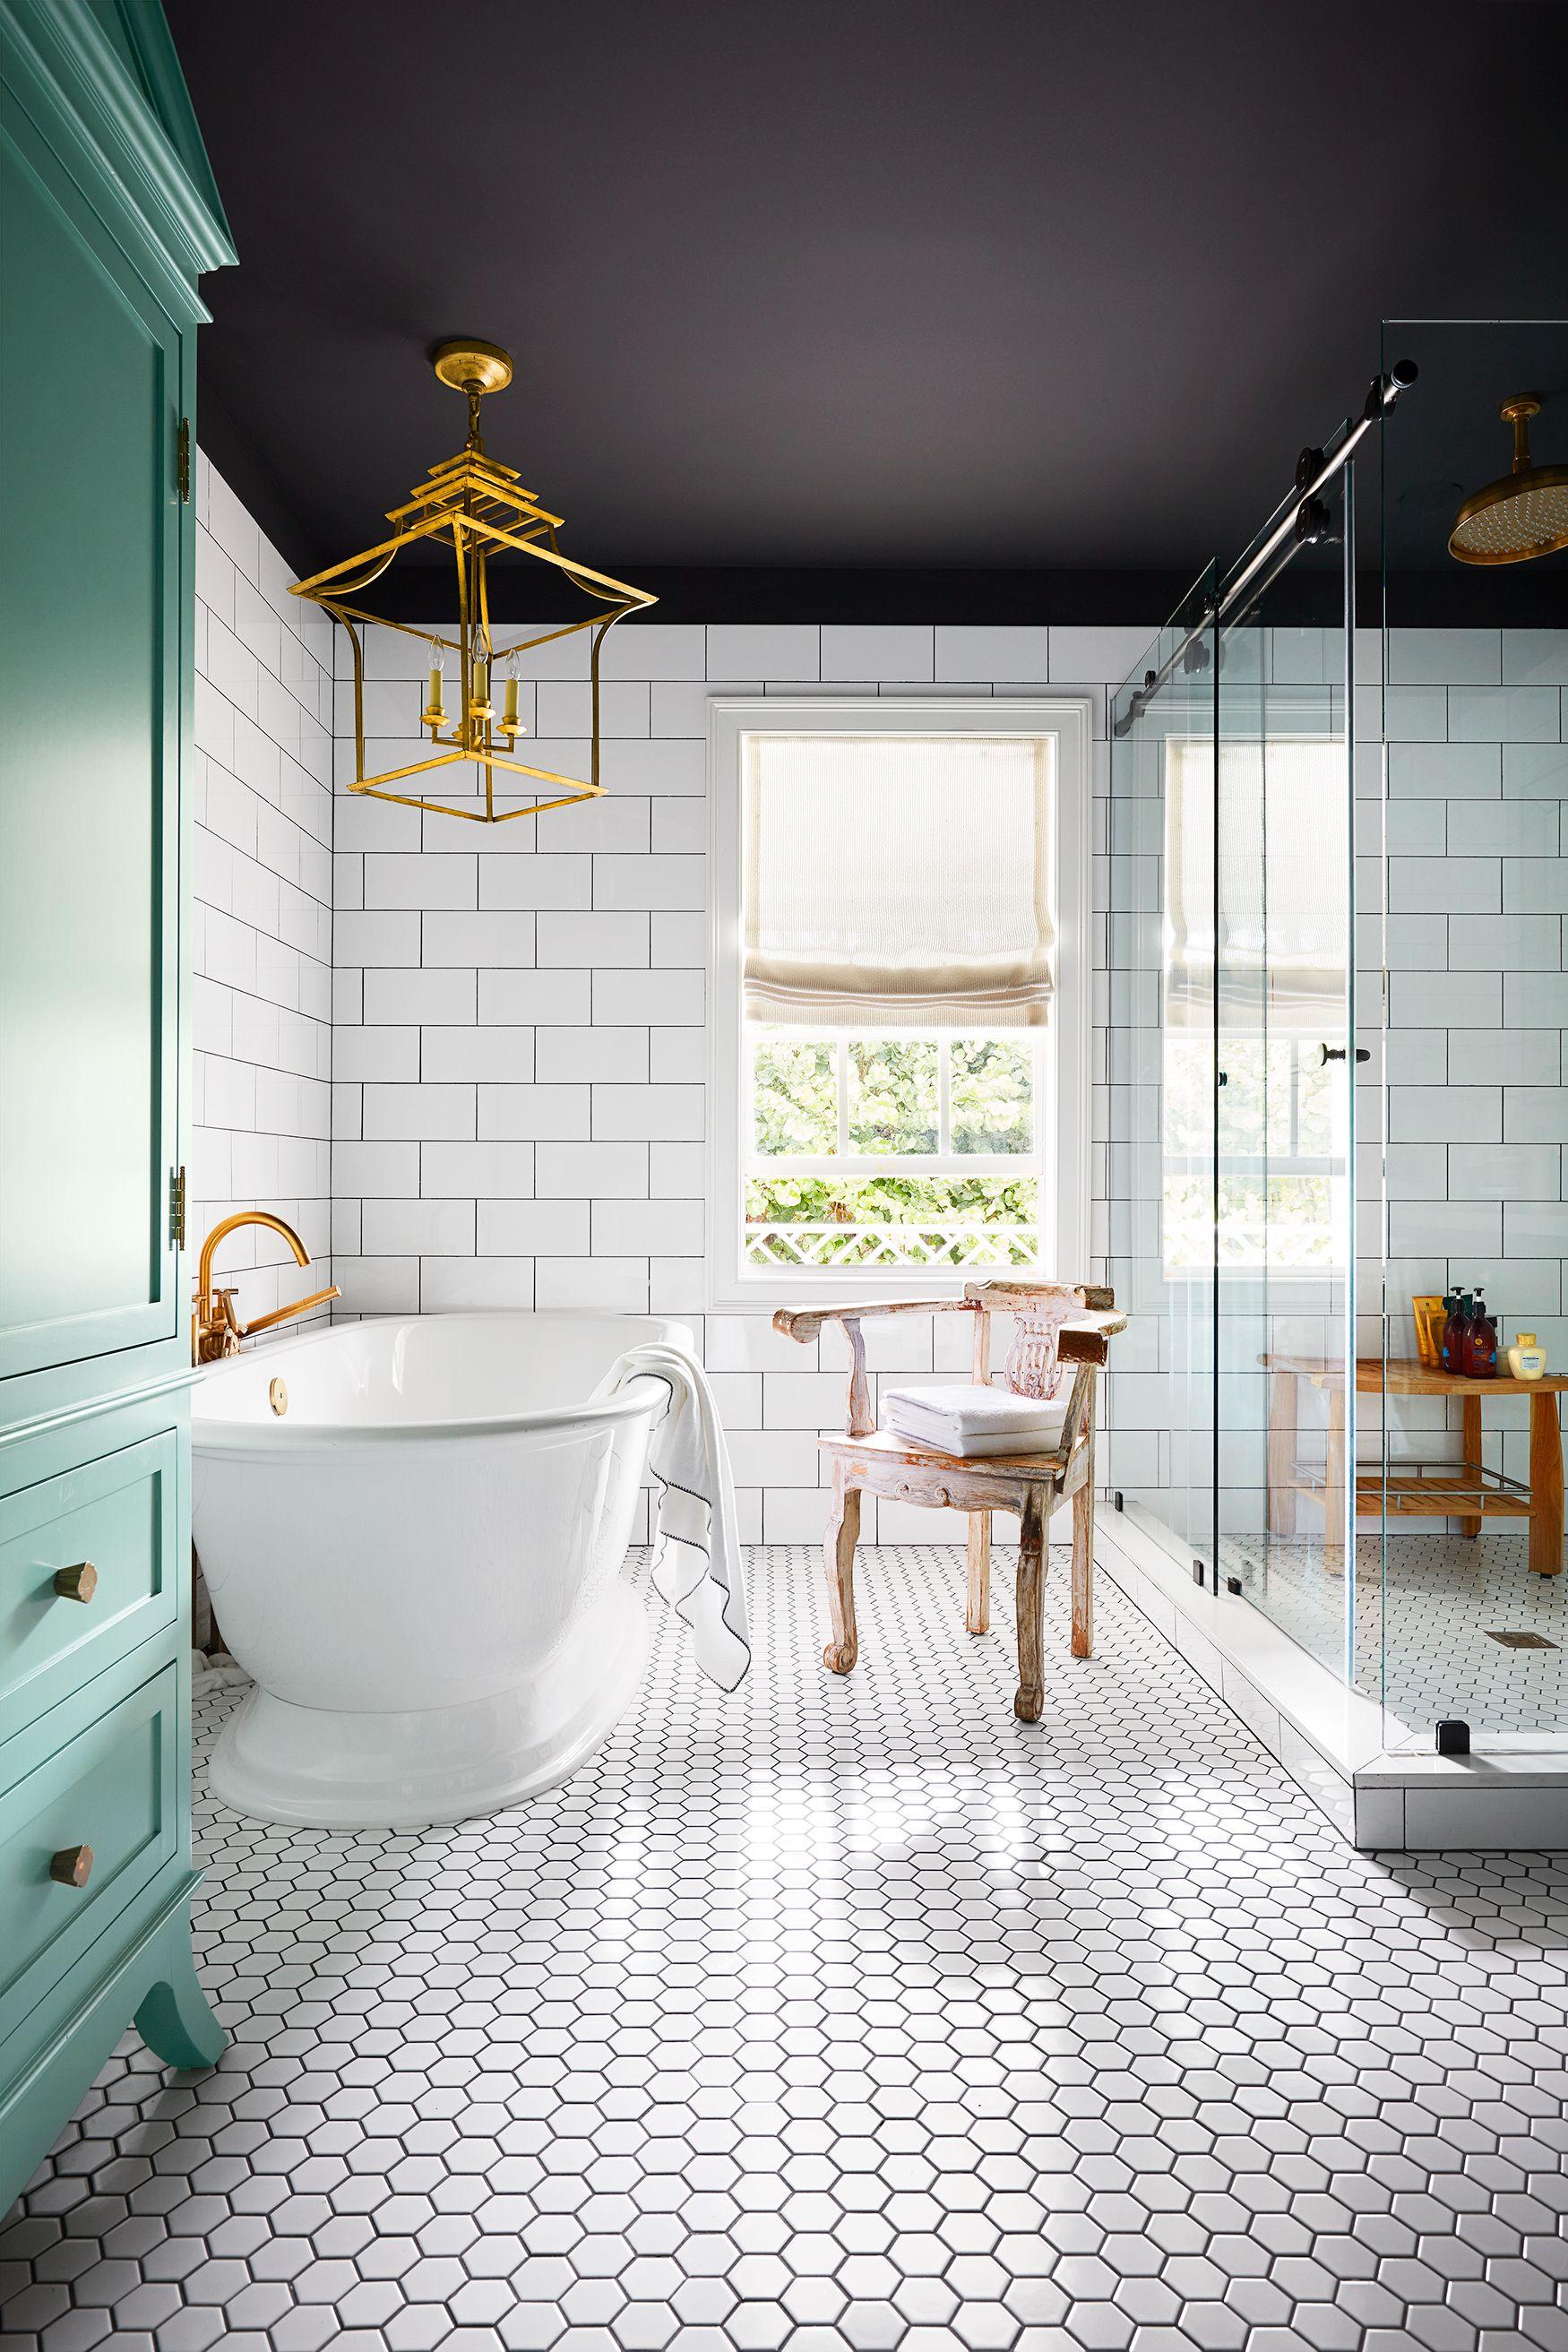 25 Best Bathroom Colors - Top Paint Colors for Bathroom Walls